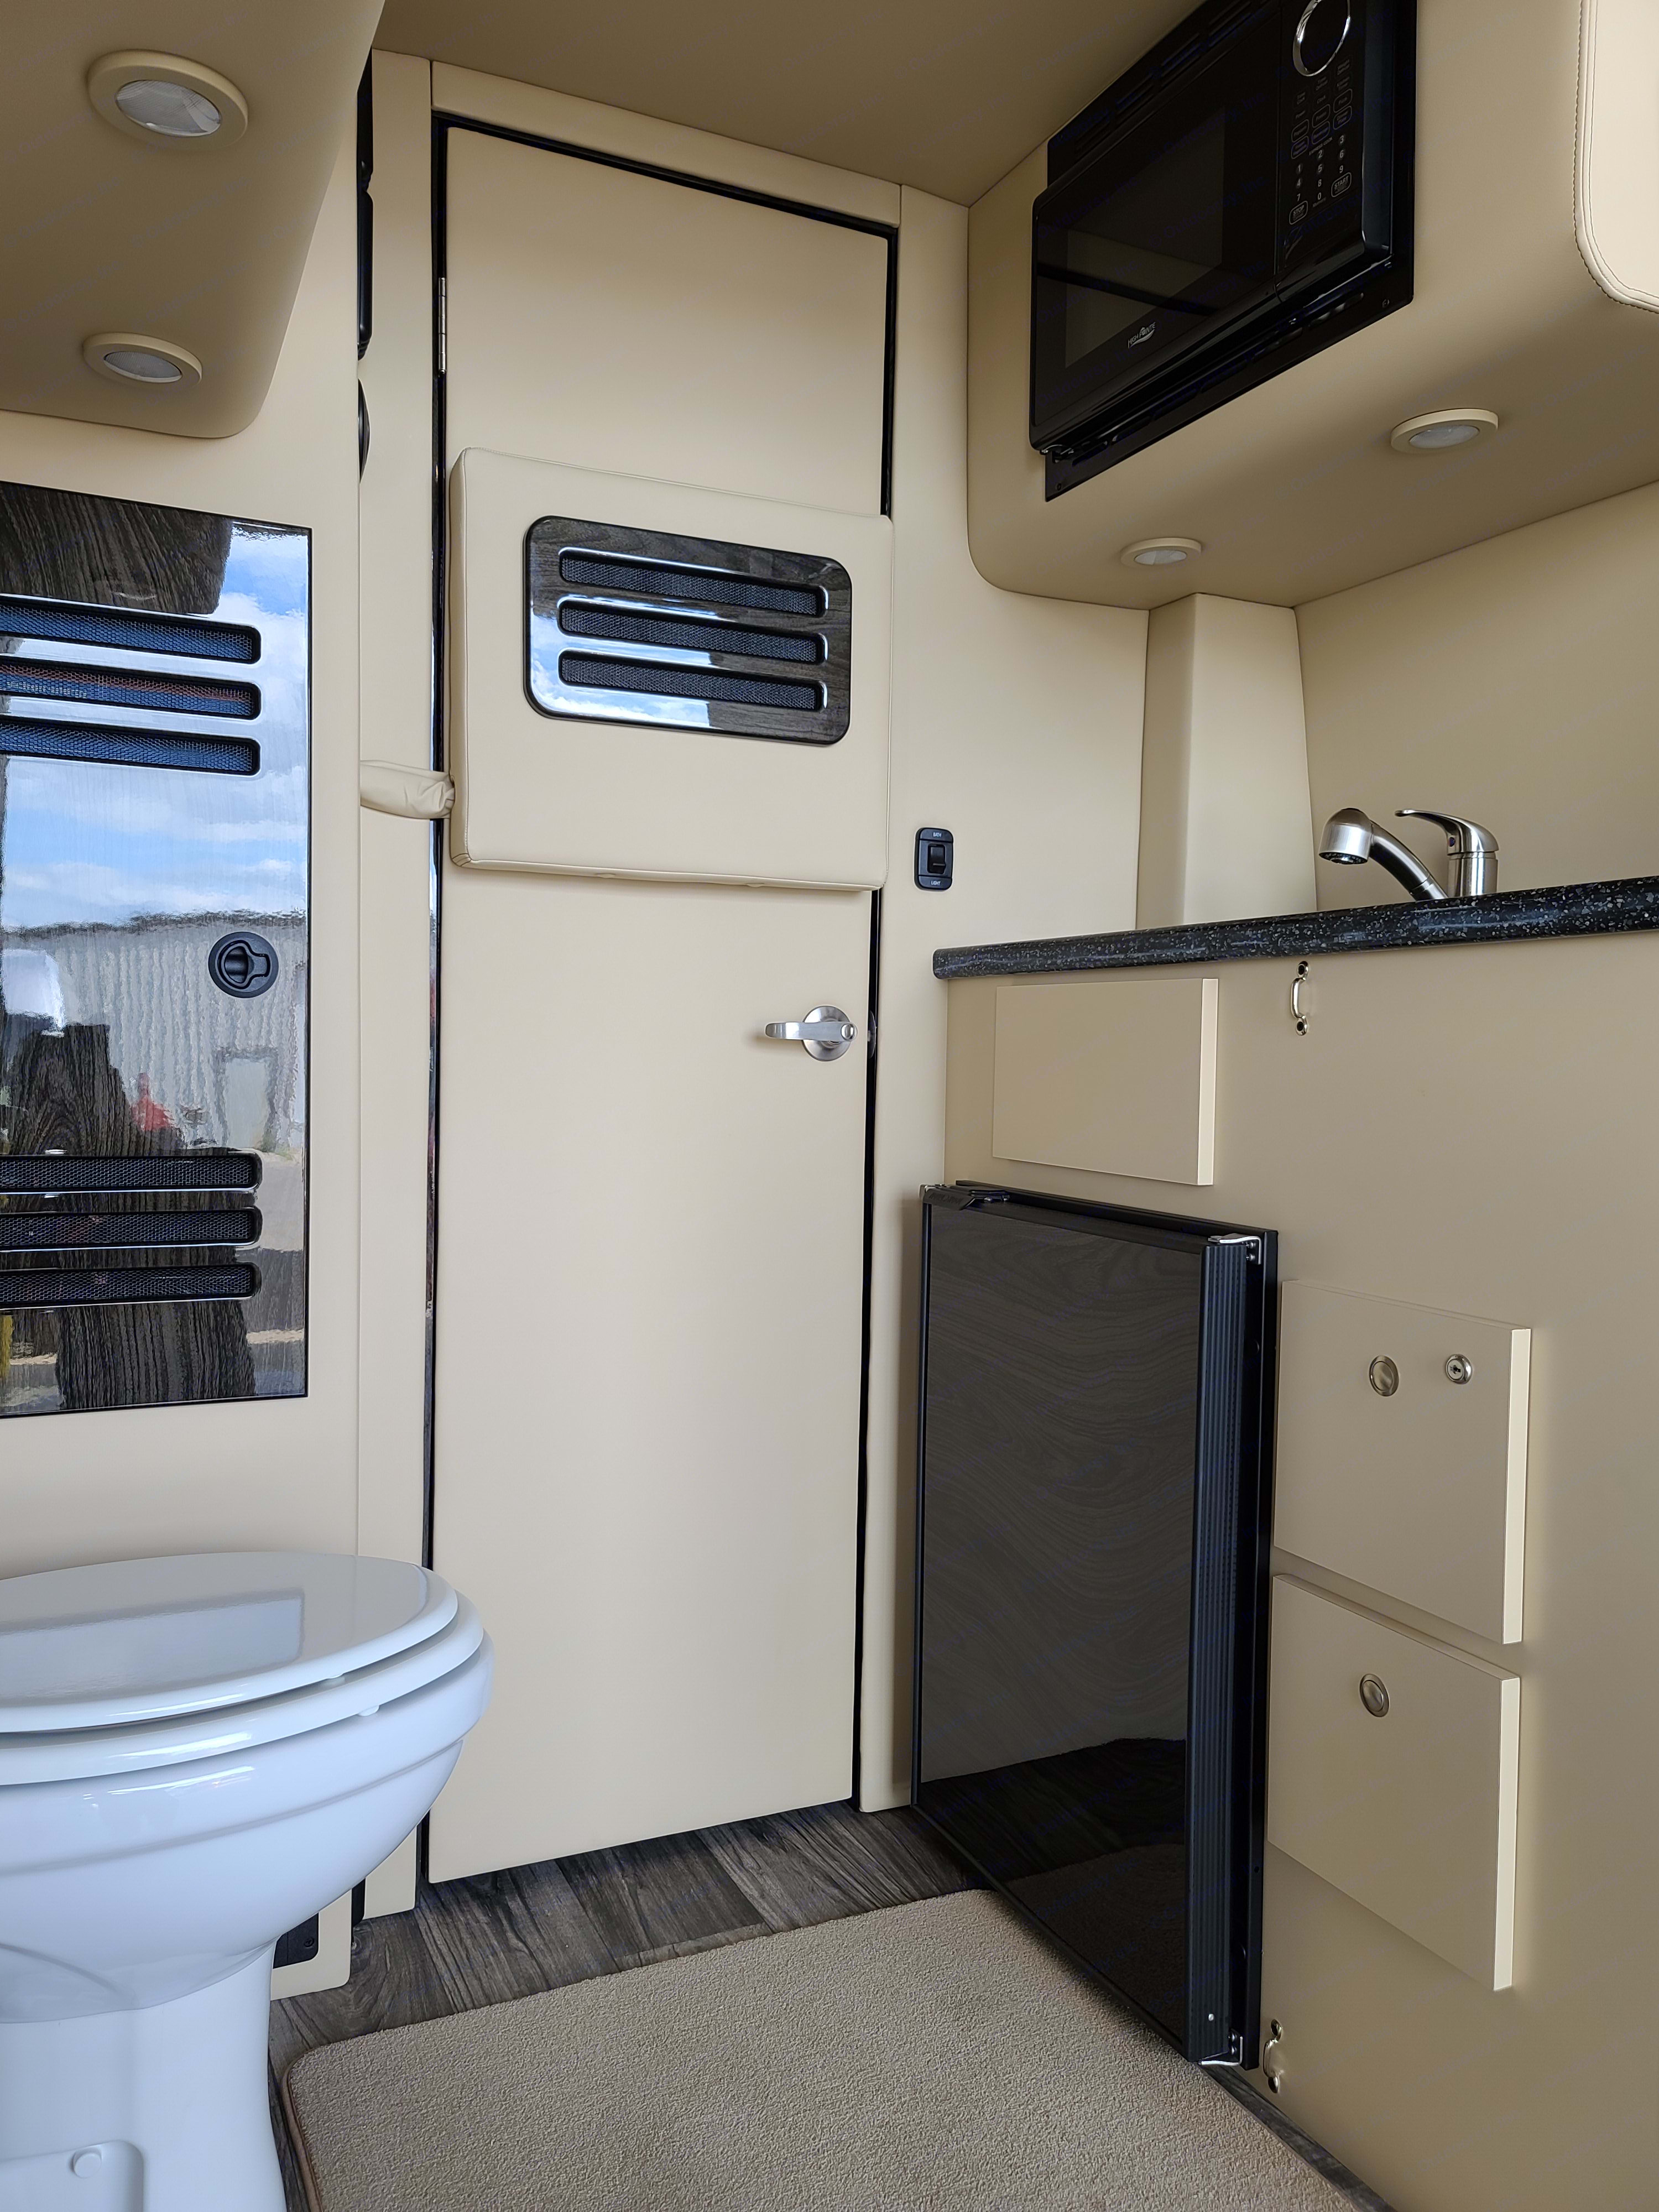 Rear Restroom with refrigerator & microwave. Ultimate Toys Presidential W/ Bath 2021